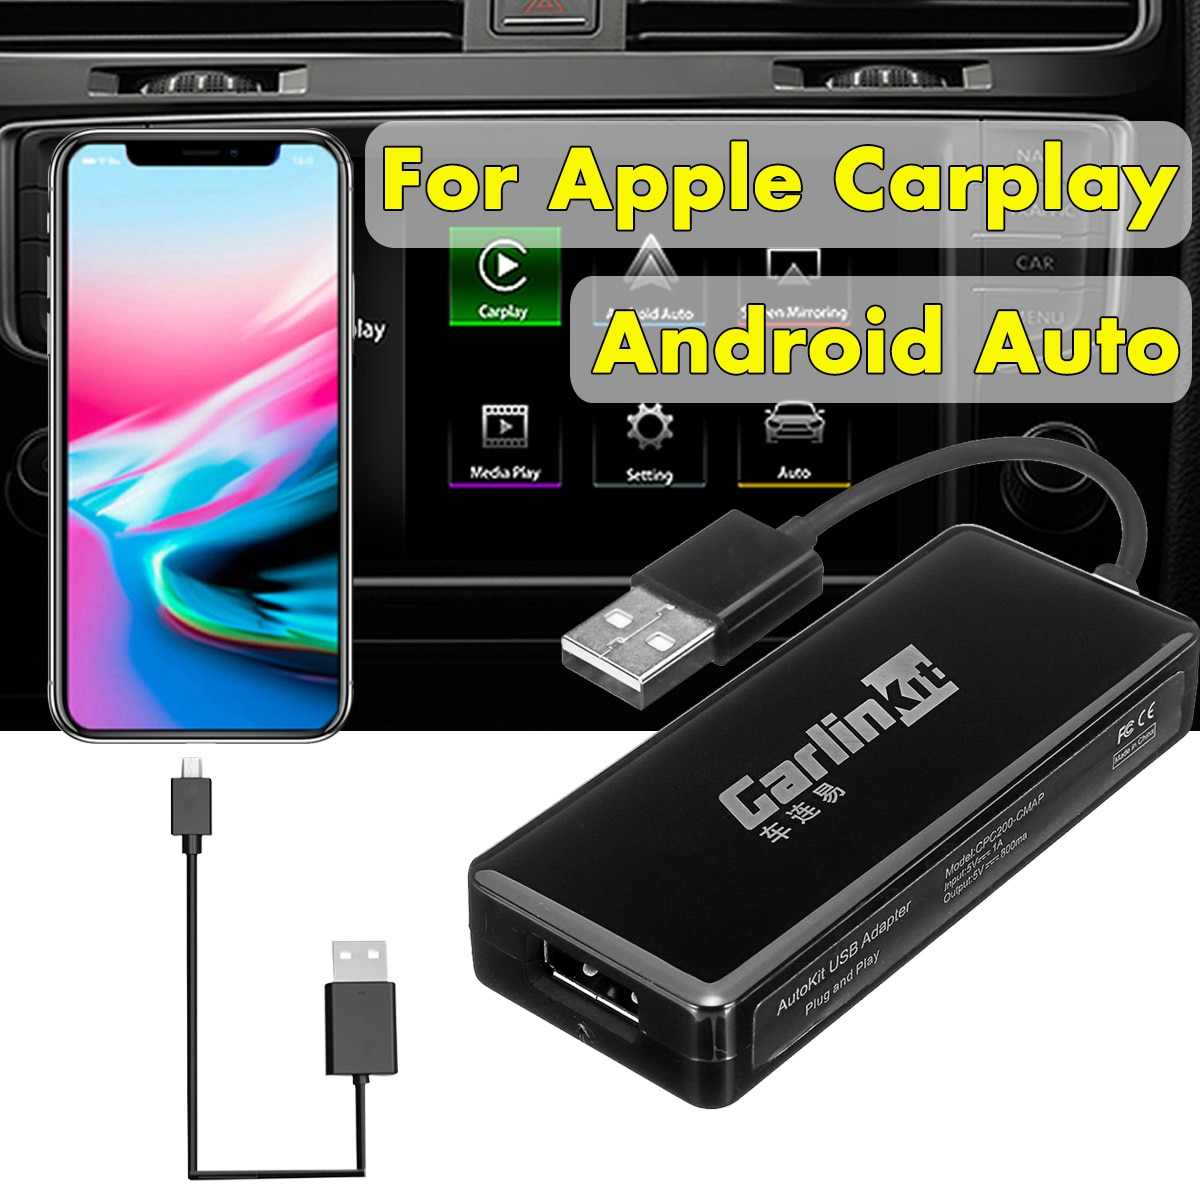 Carlinkit USB Smart Car Play Dongle For Android Car Navigation For Apple Carplay Module Auto Smart Phone USB Carplay Adapter